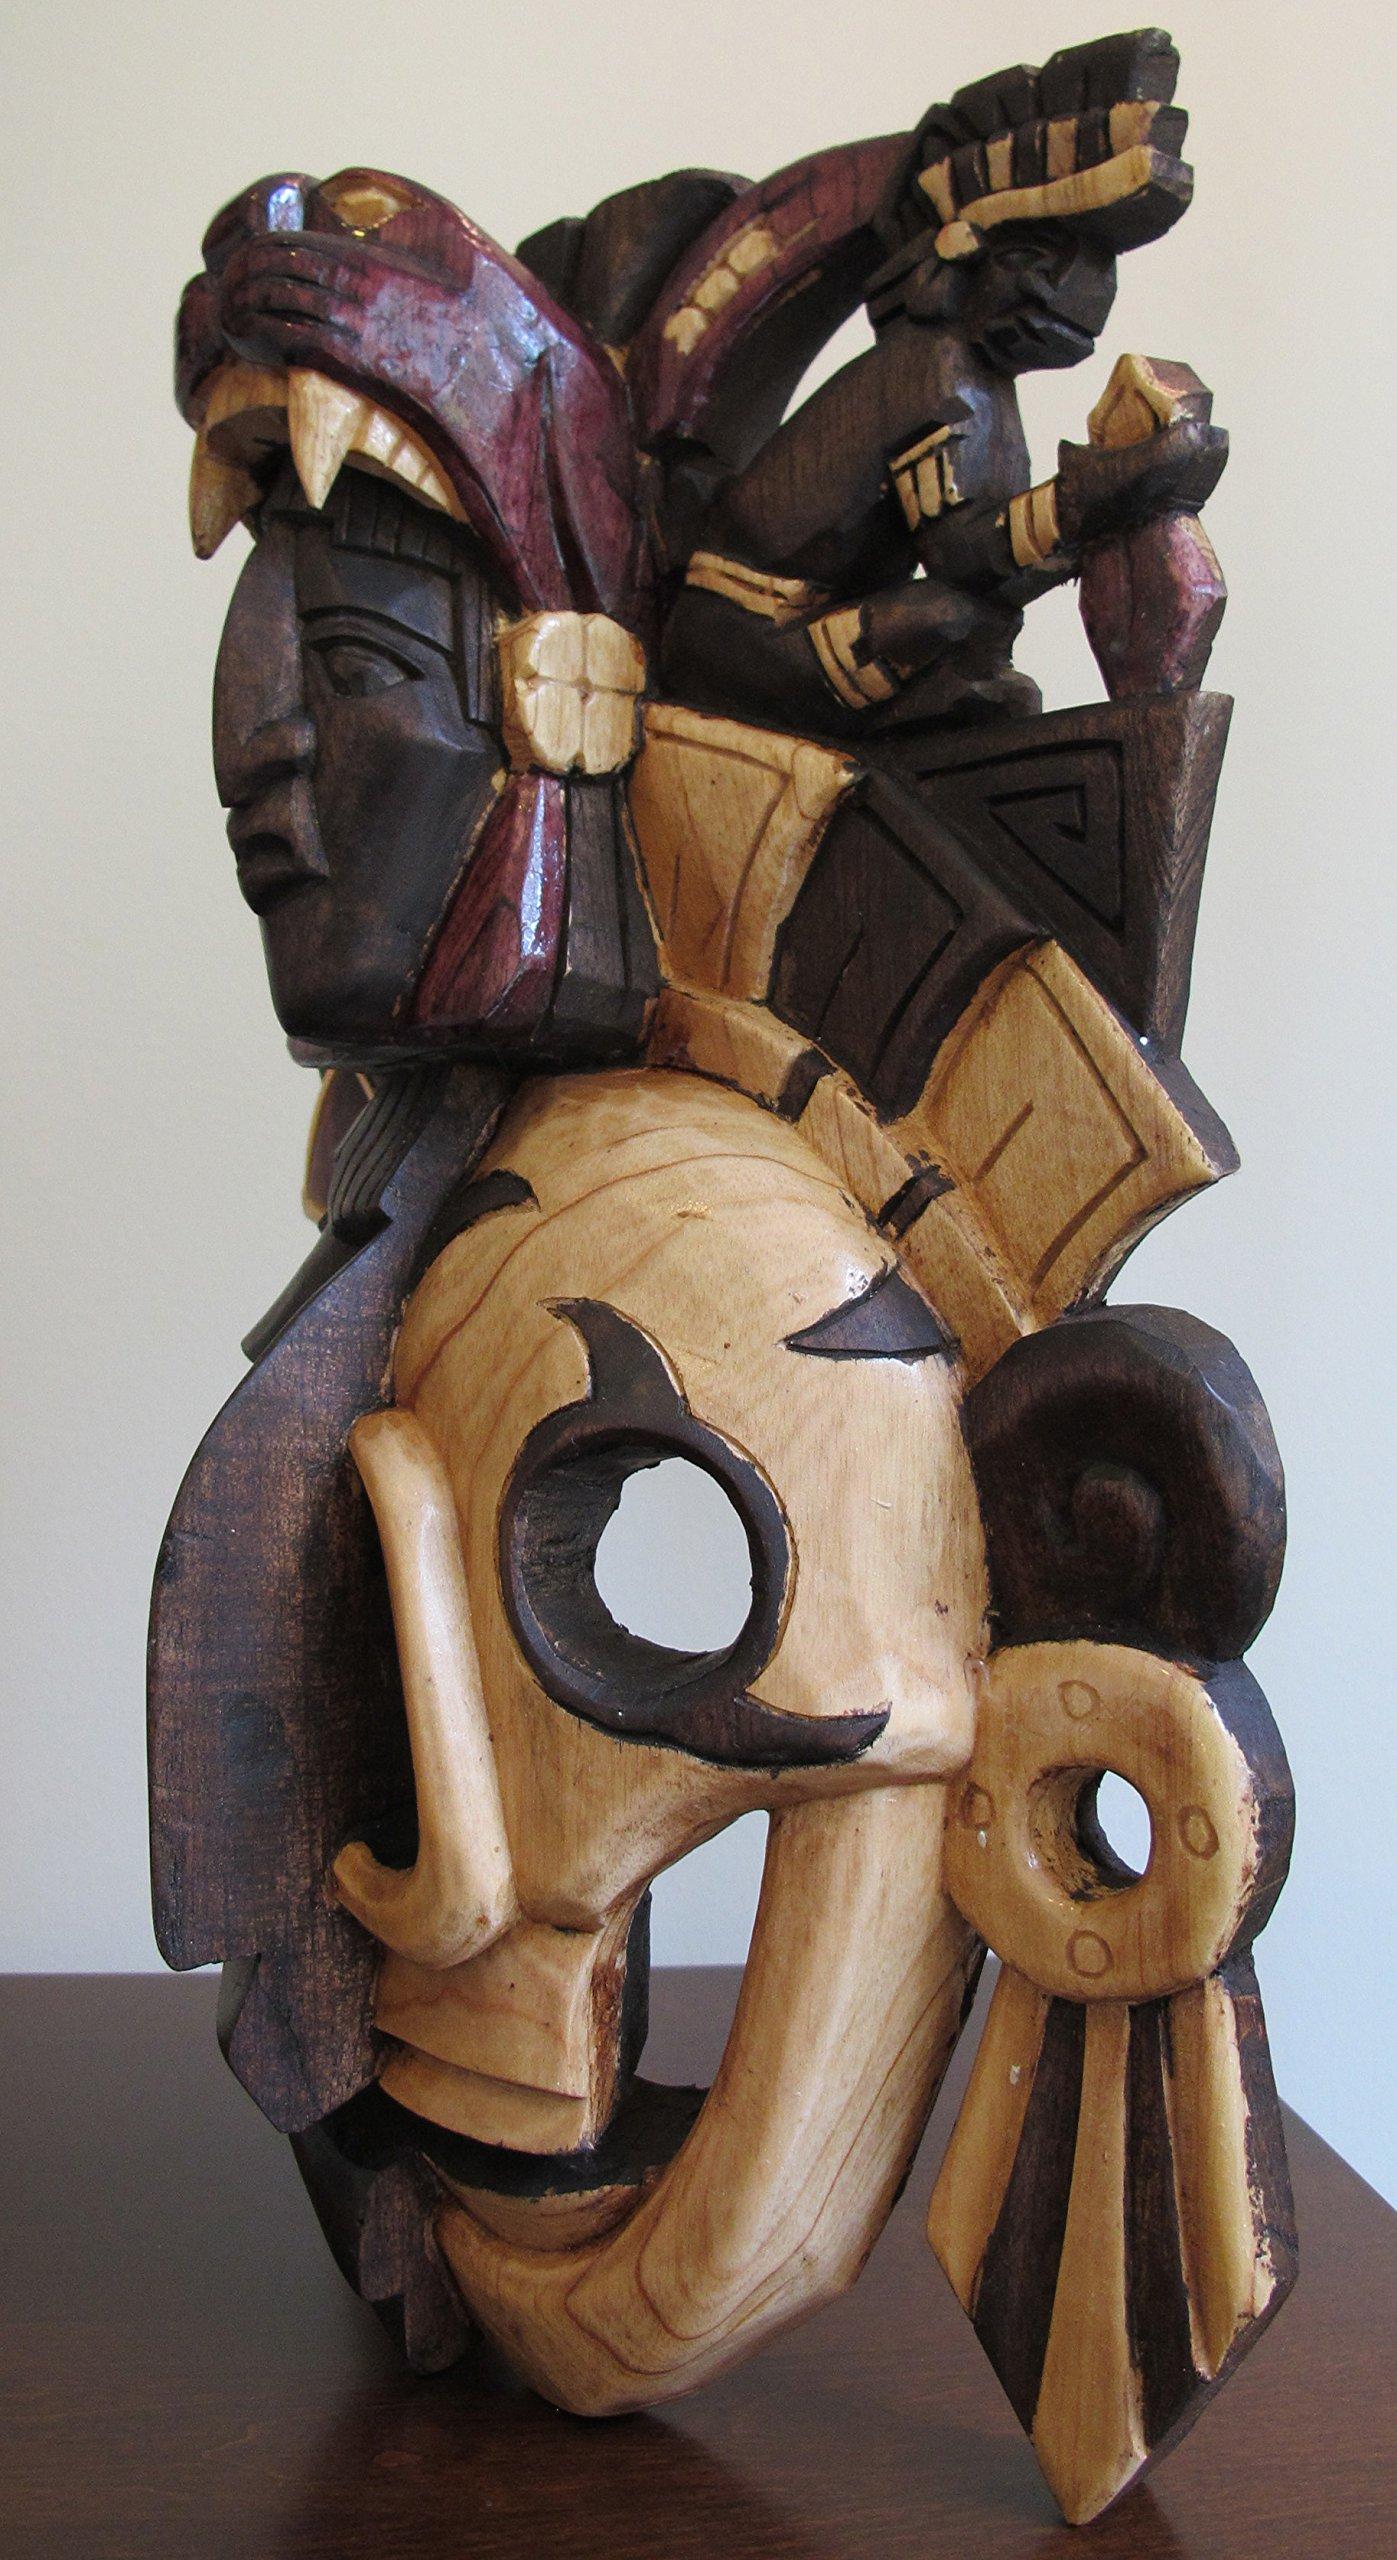 Mayan Mask - Half Skull *Premium Craft* by Sofia's Findings